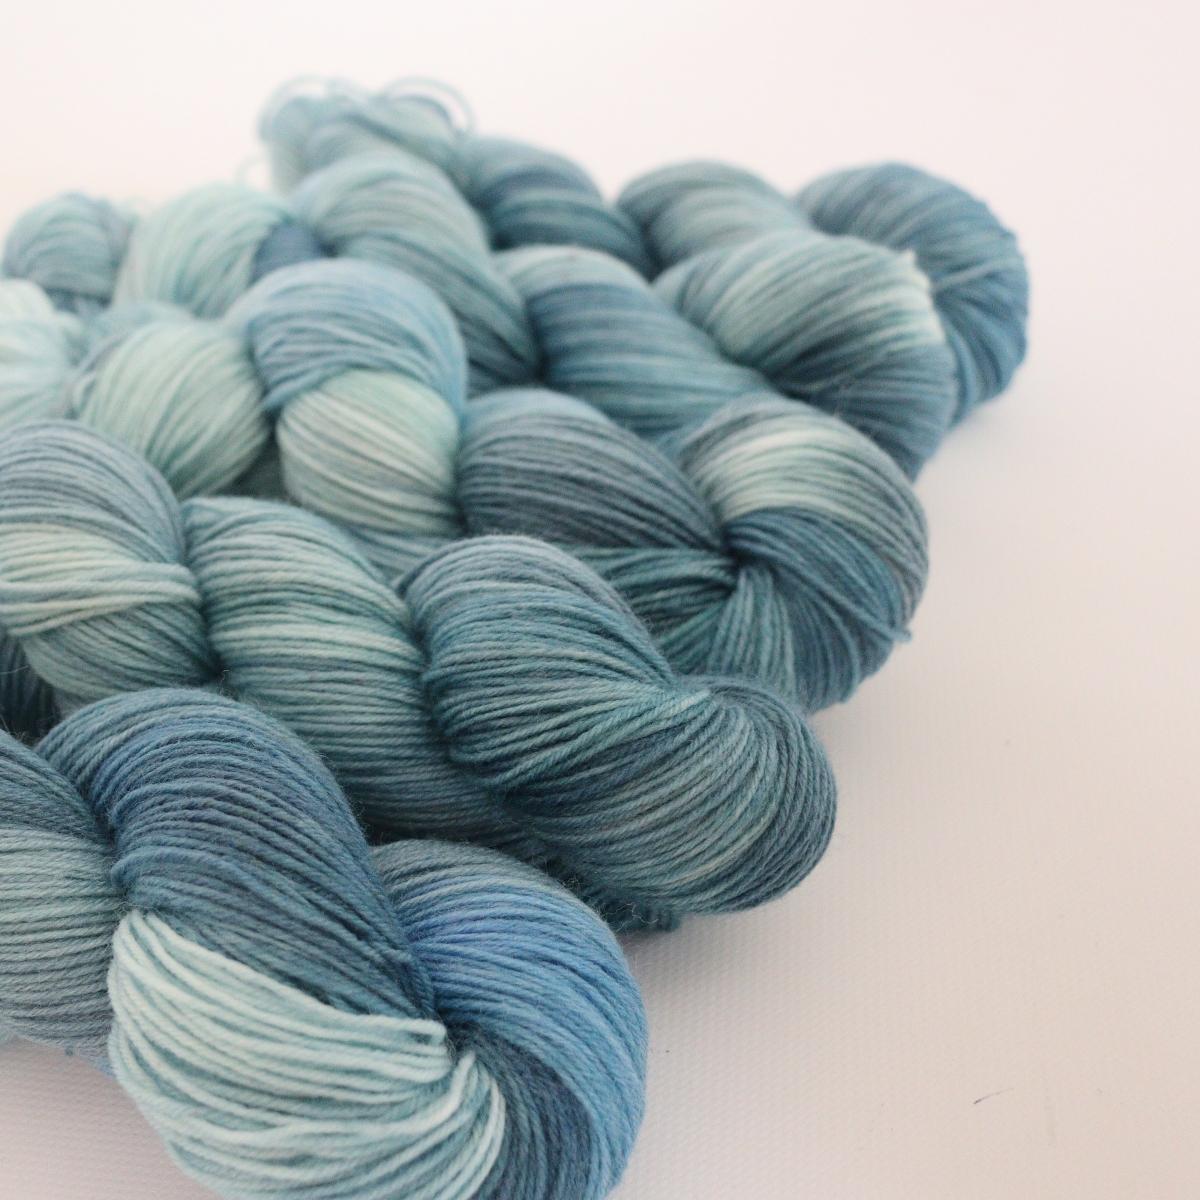 woodico.pro hand dyed yarn 066 1200x1200 - Hand dyed yarn / 066